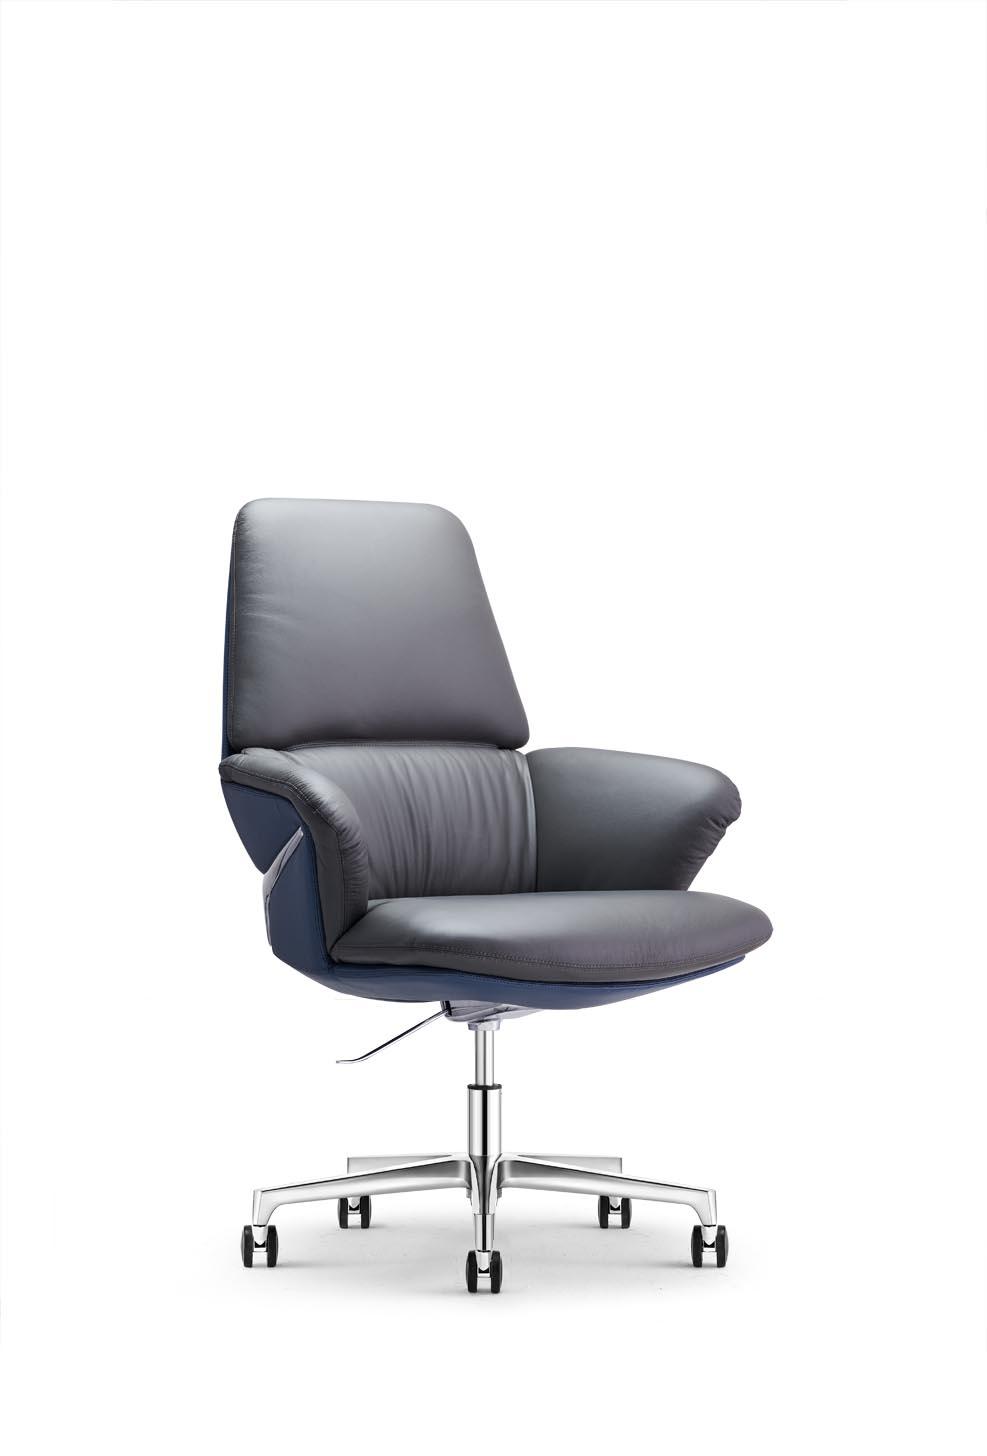 OP-BX60018 (3)